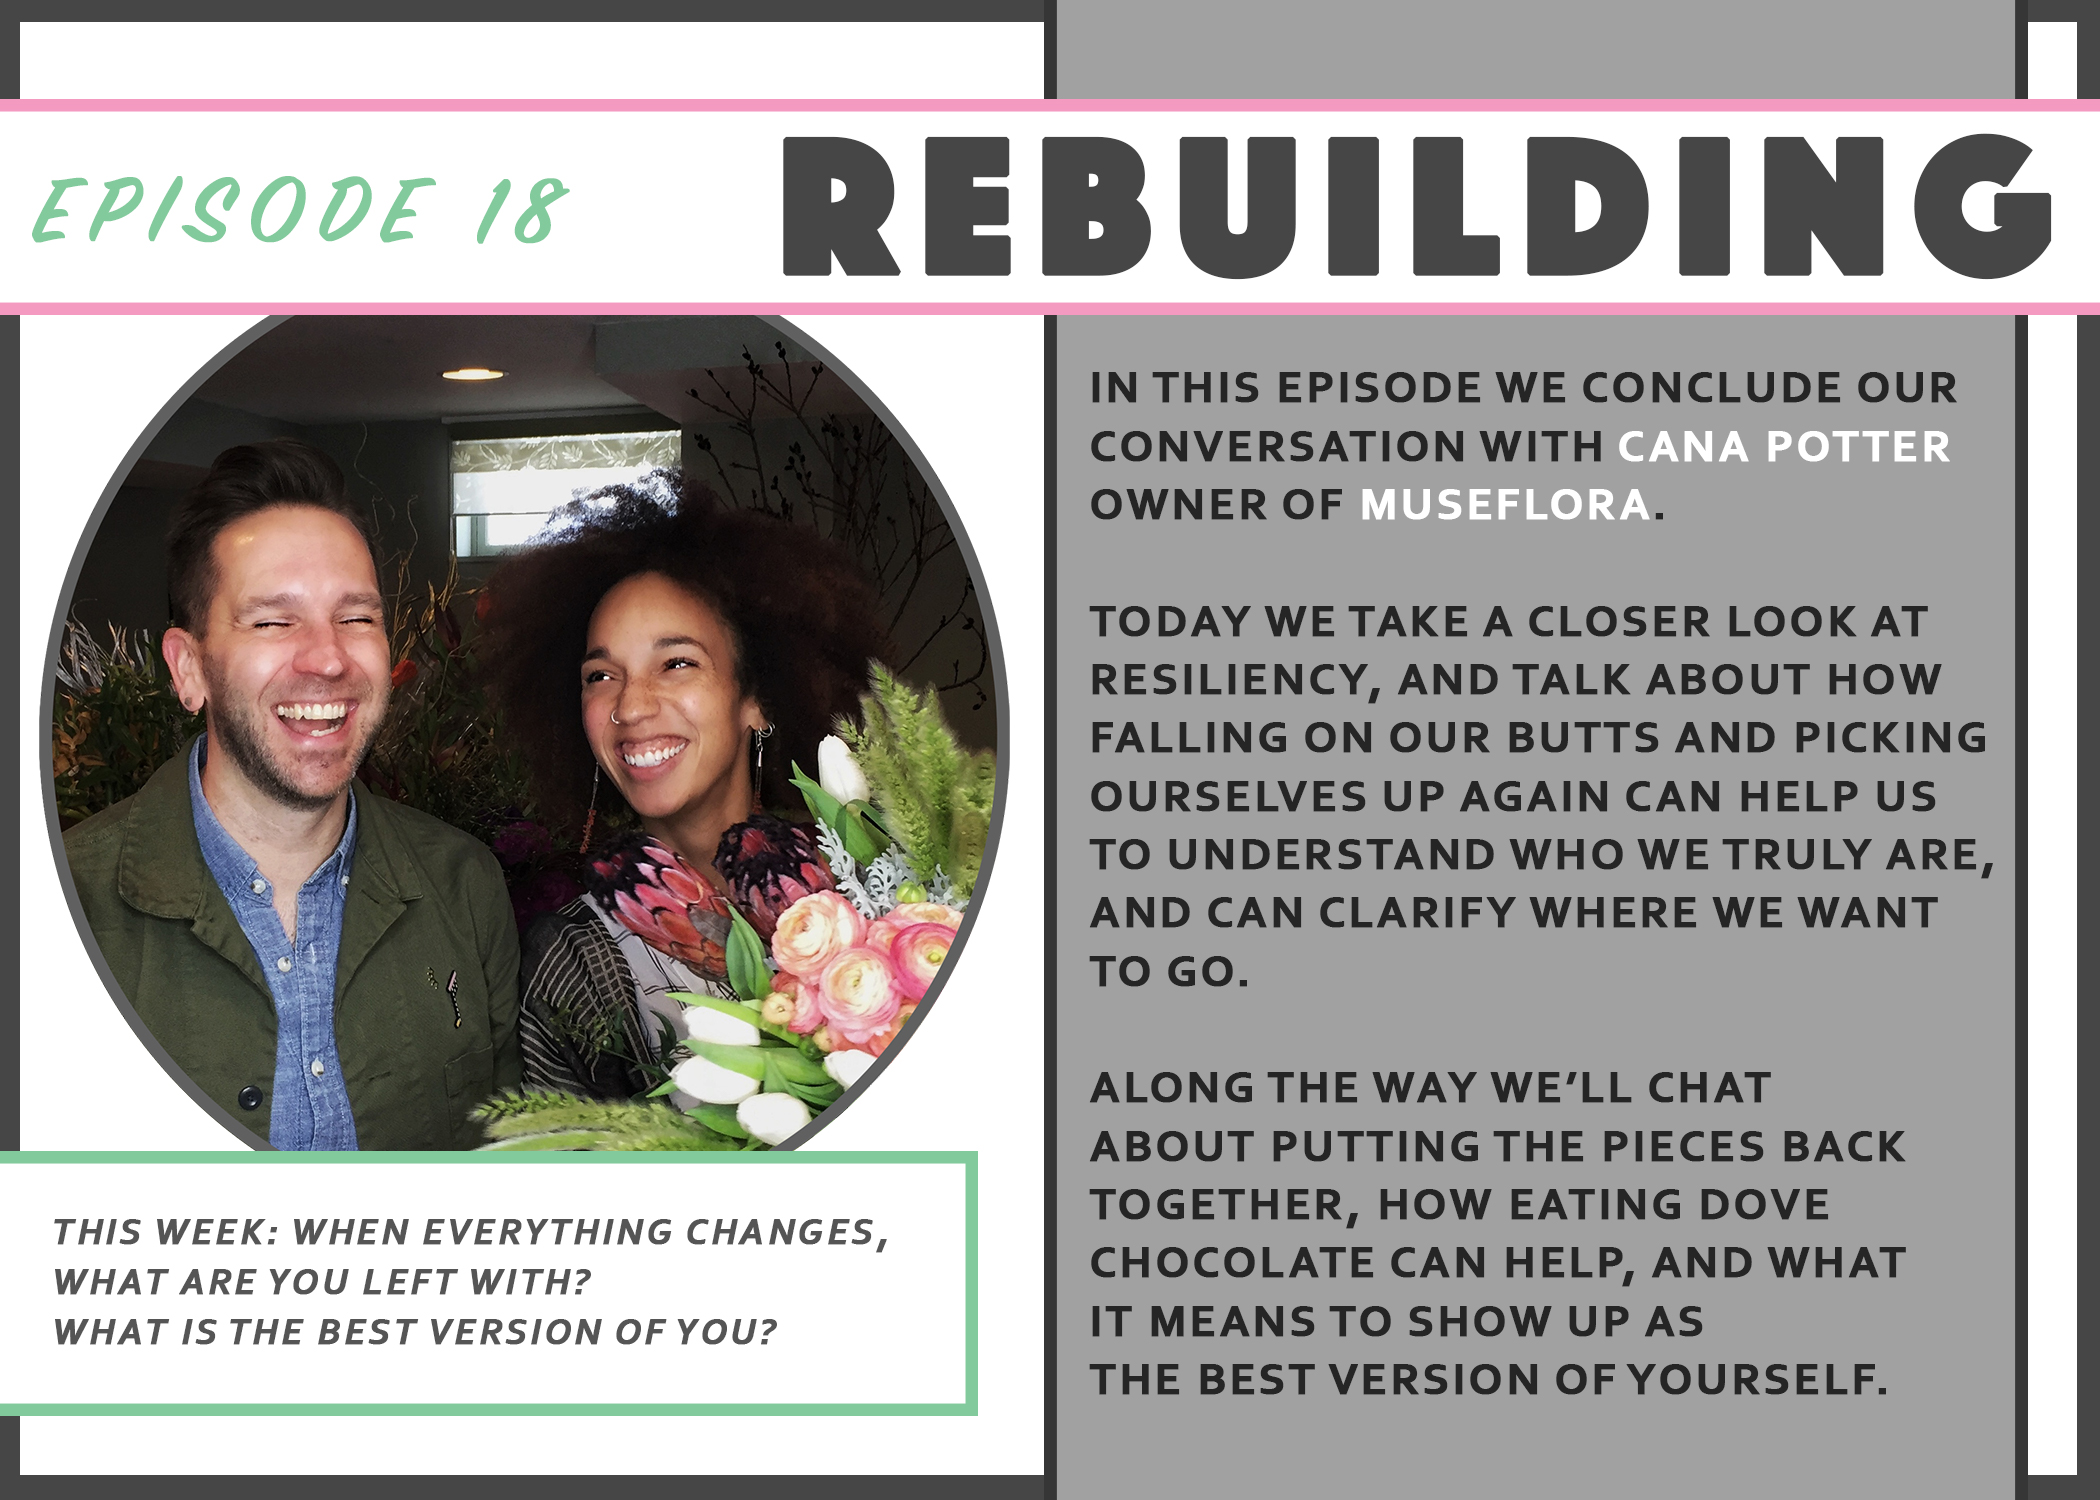 Rebuilding Cana -episode - card.jpg